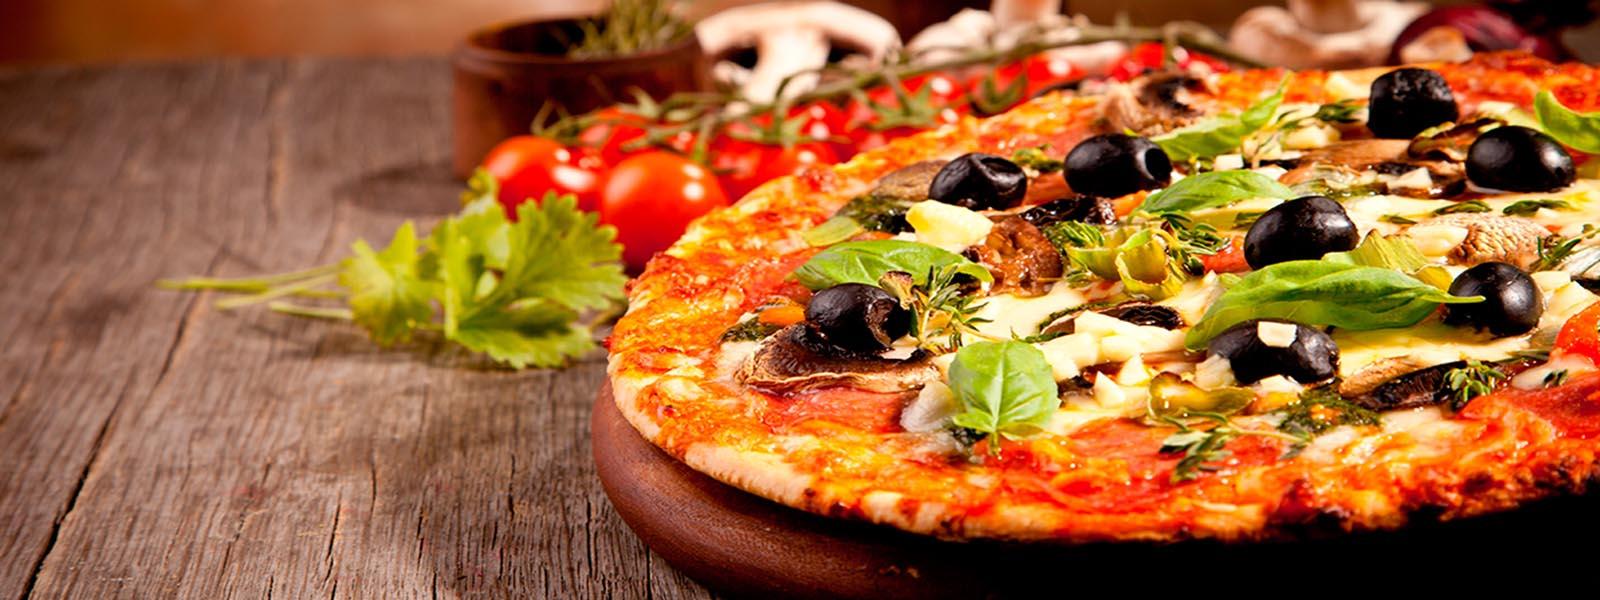 Bitz N Pizzas Bitz N Pizzas Whitby Takeaway Order Online